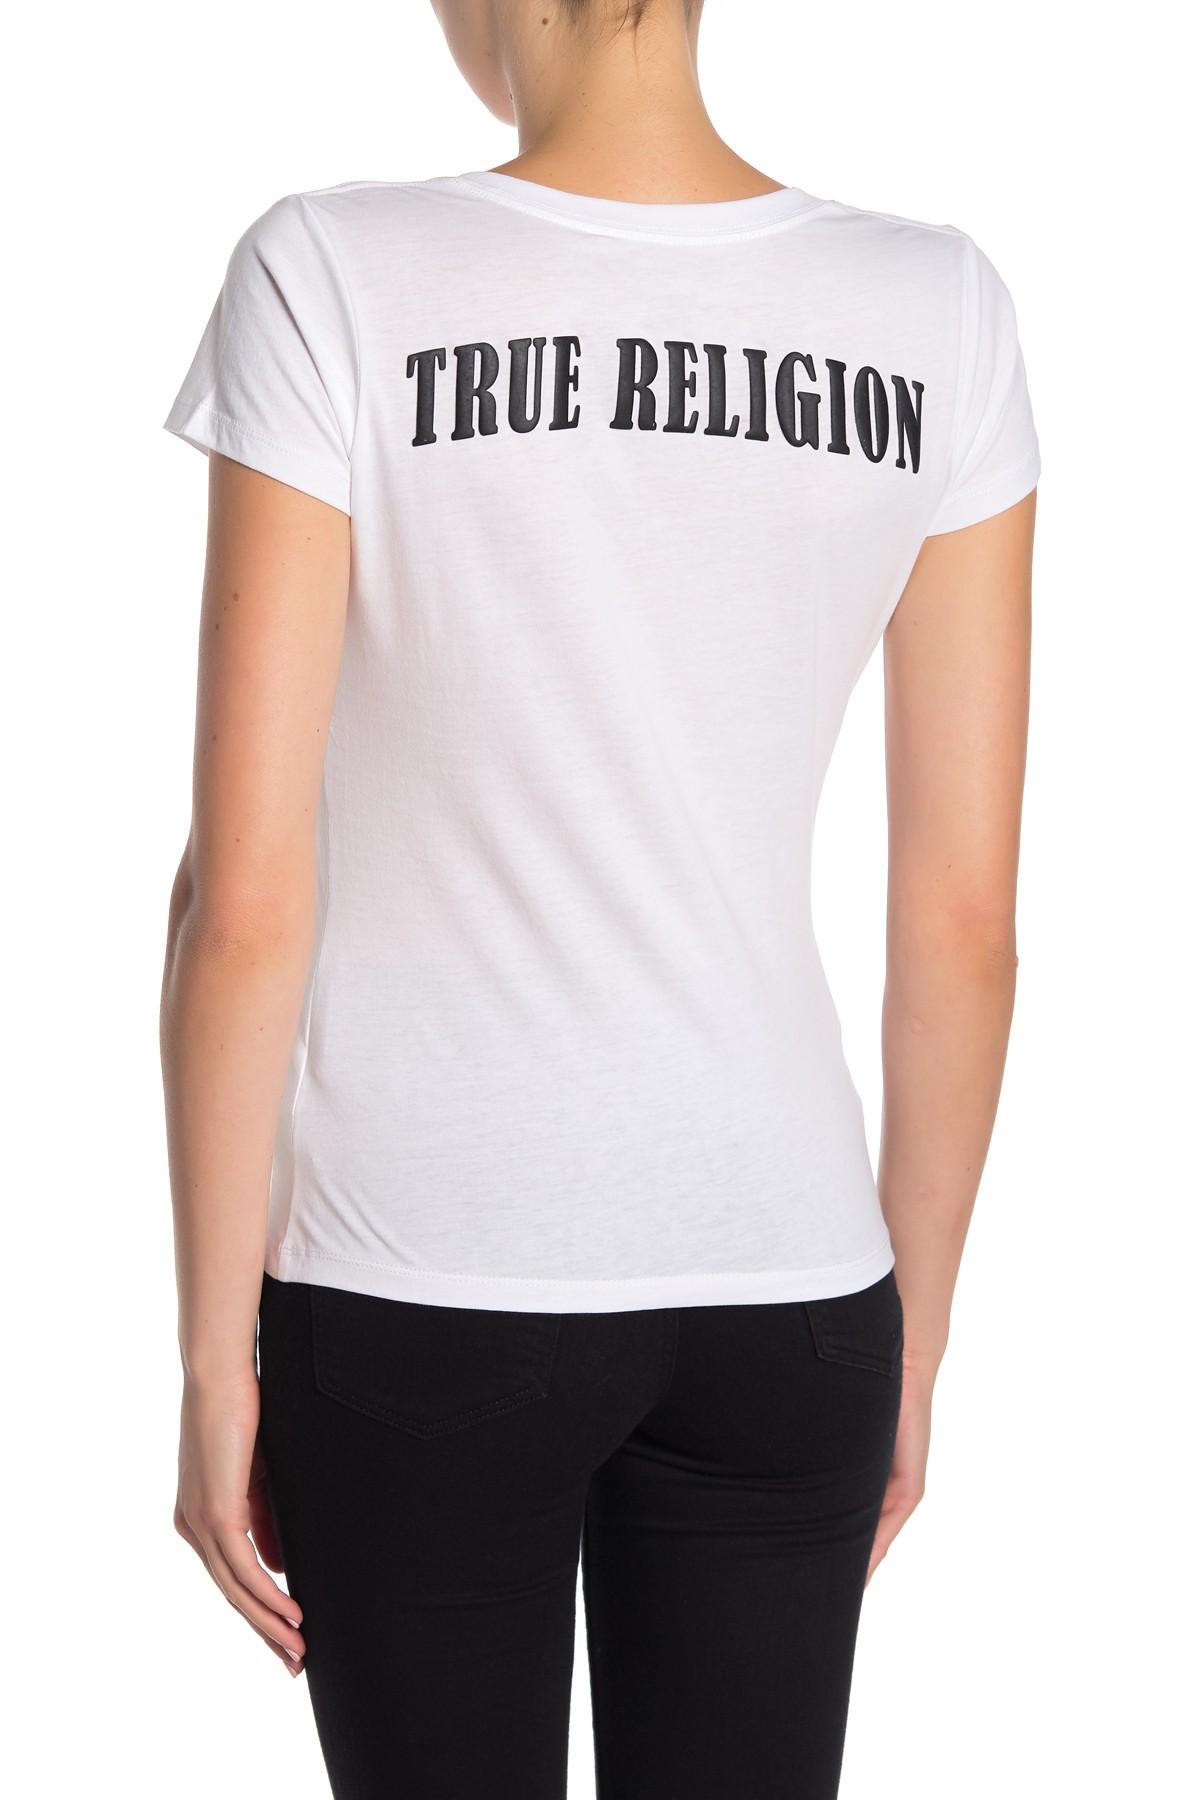 True-Religion-Women-039-s-Double-Puff-V-Neck-Tee-T-Shirt thumbnail 9